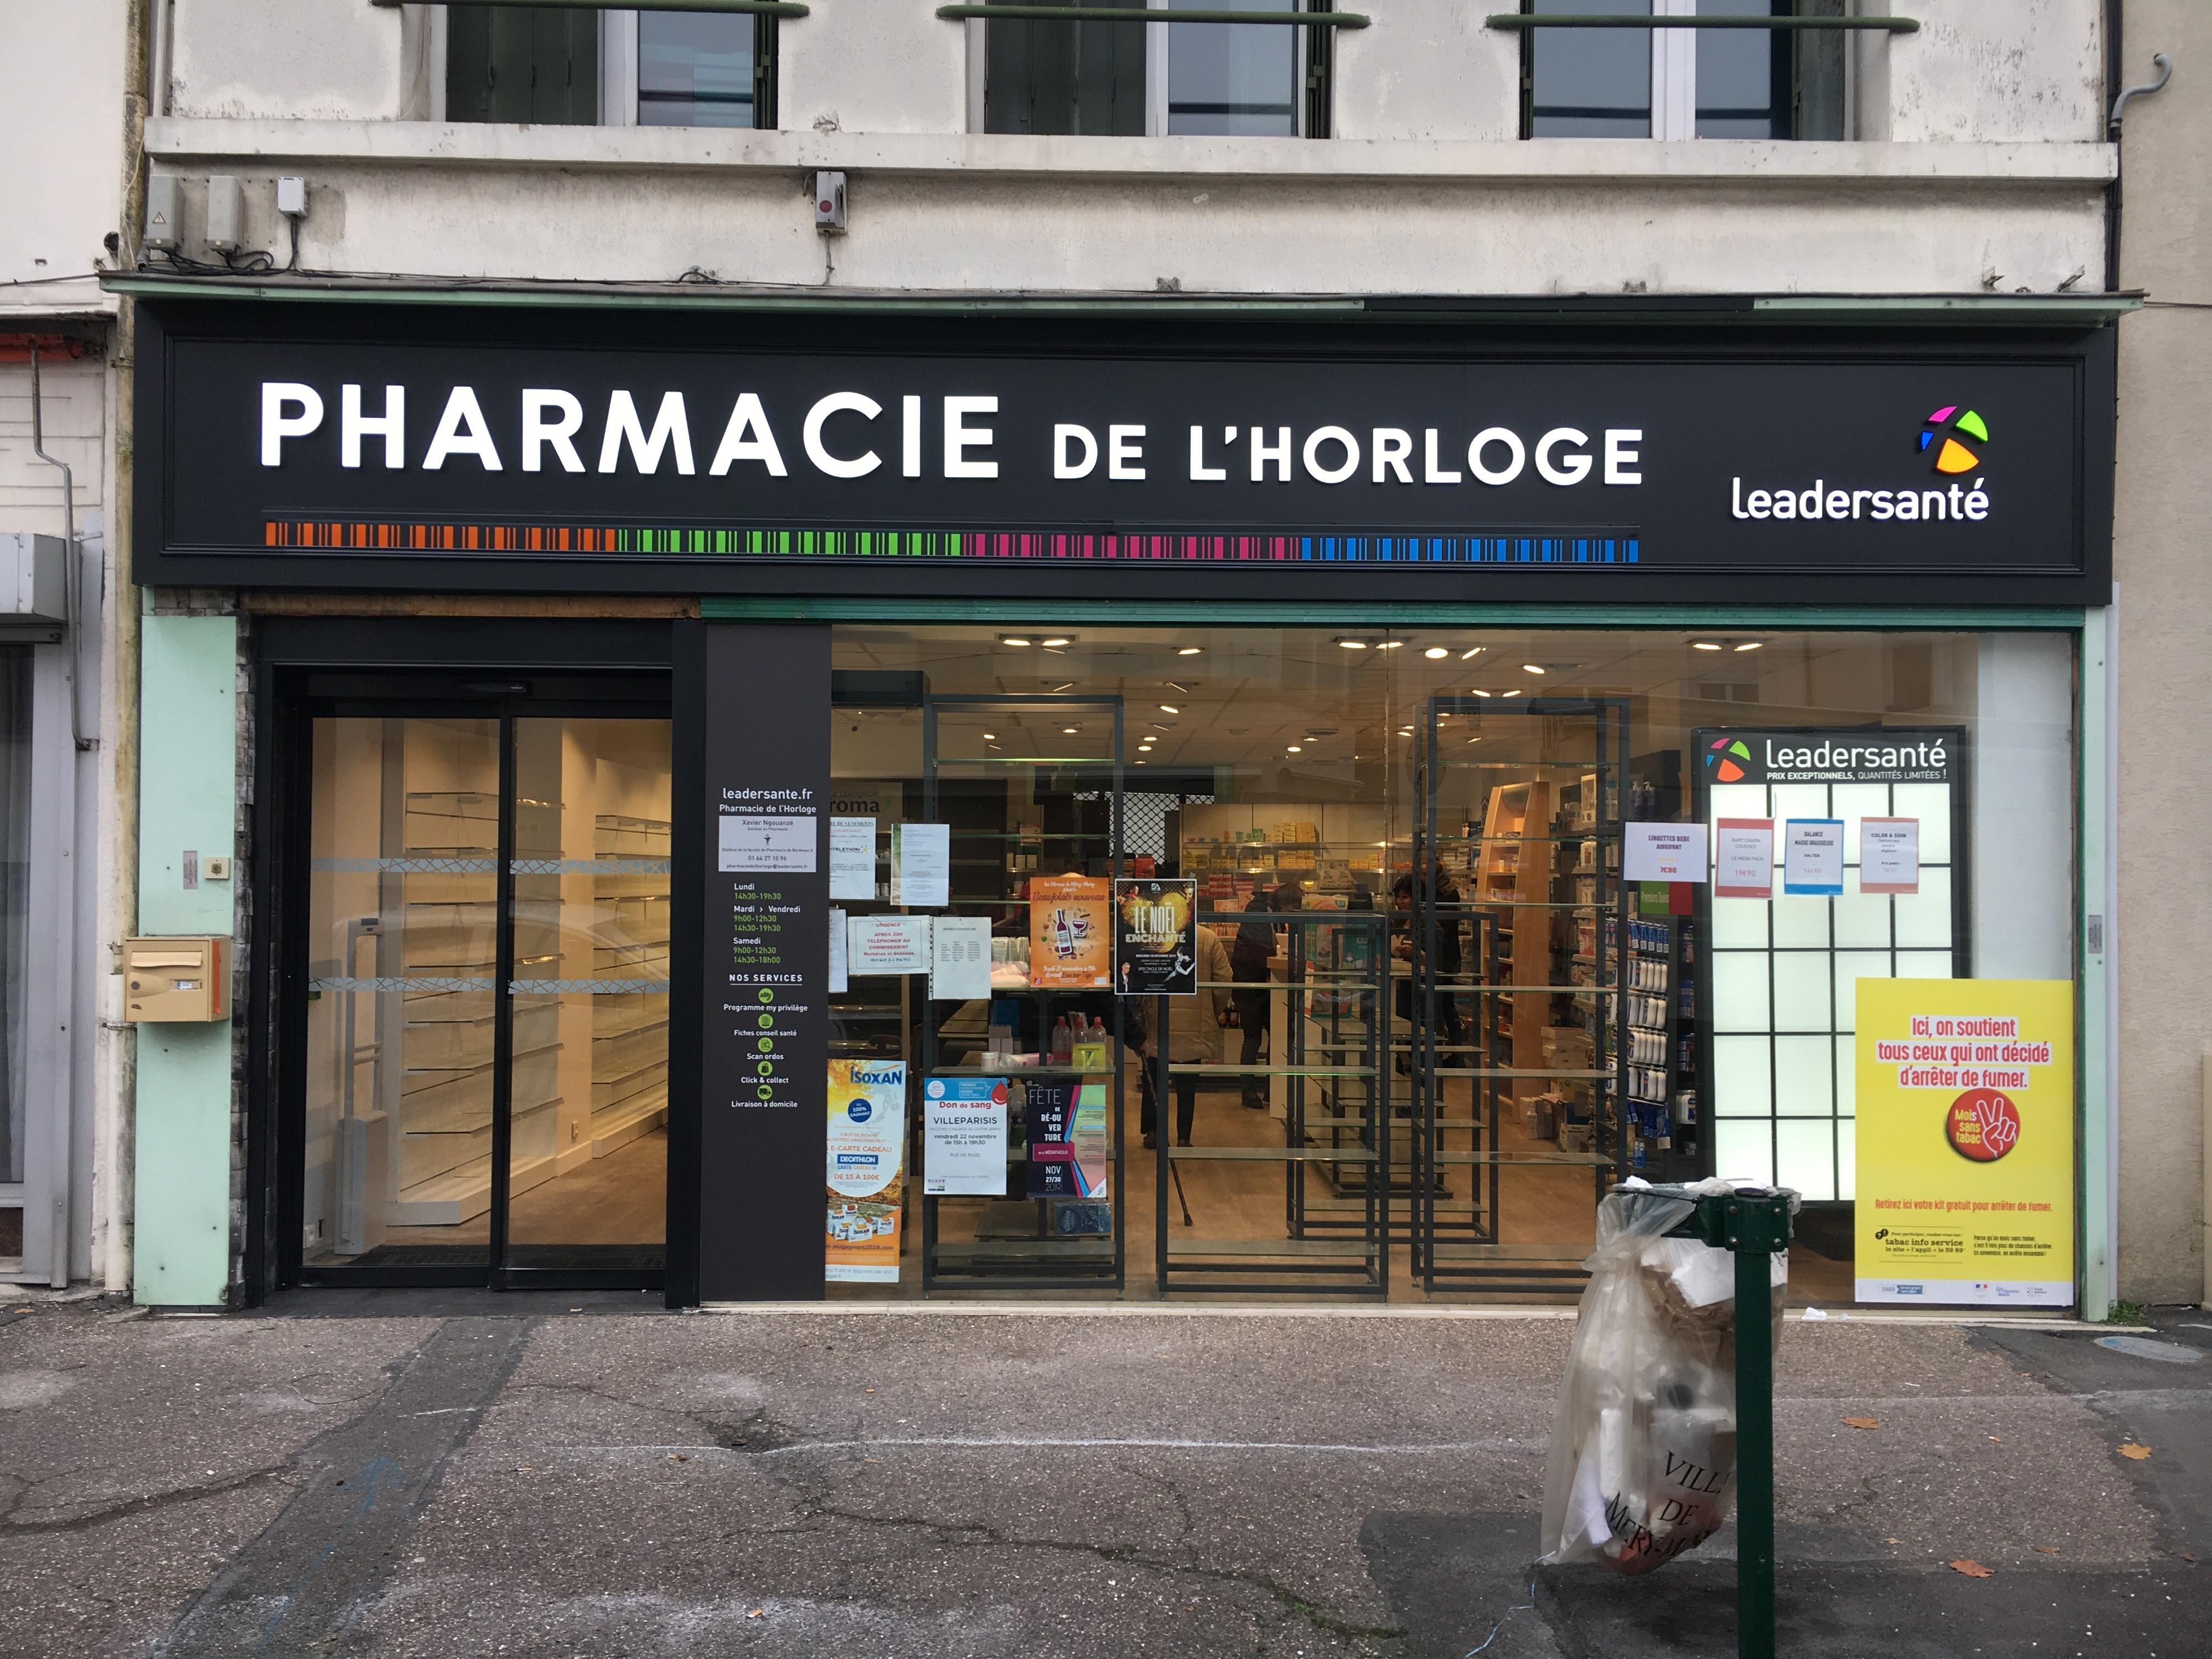 Pharmacie de l'Horloge